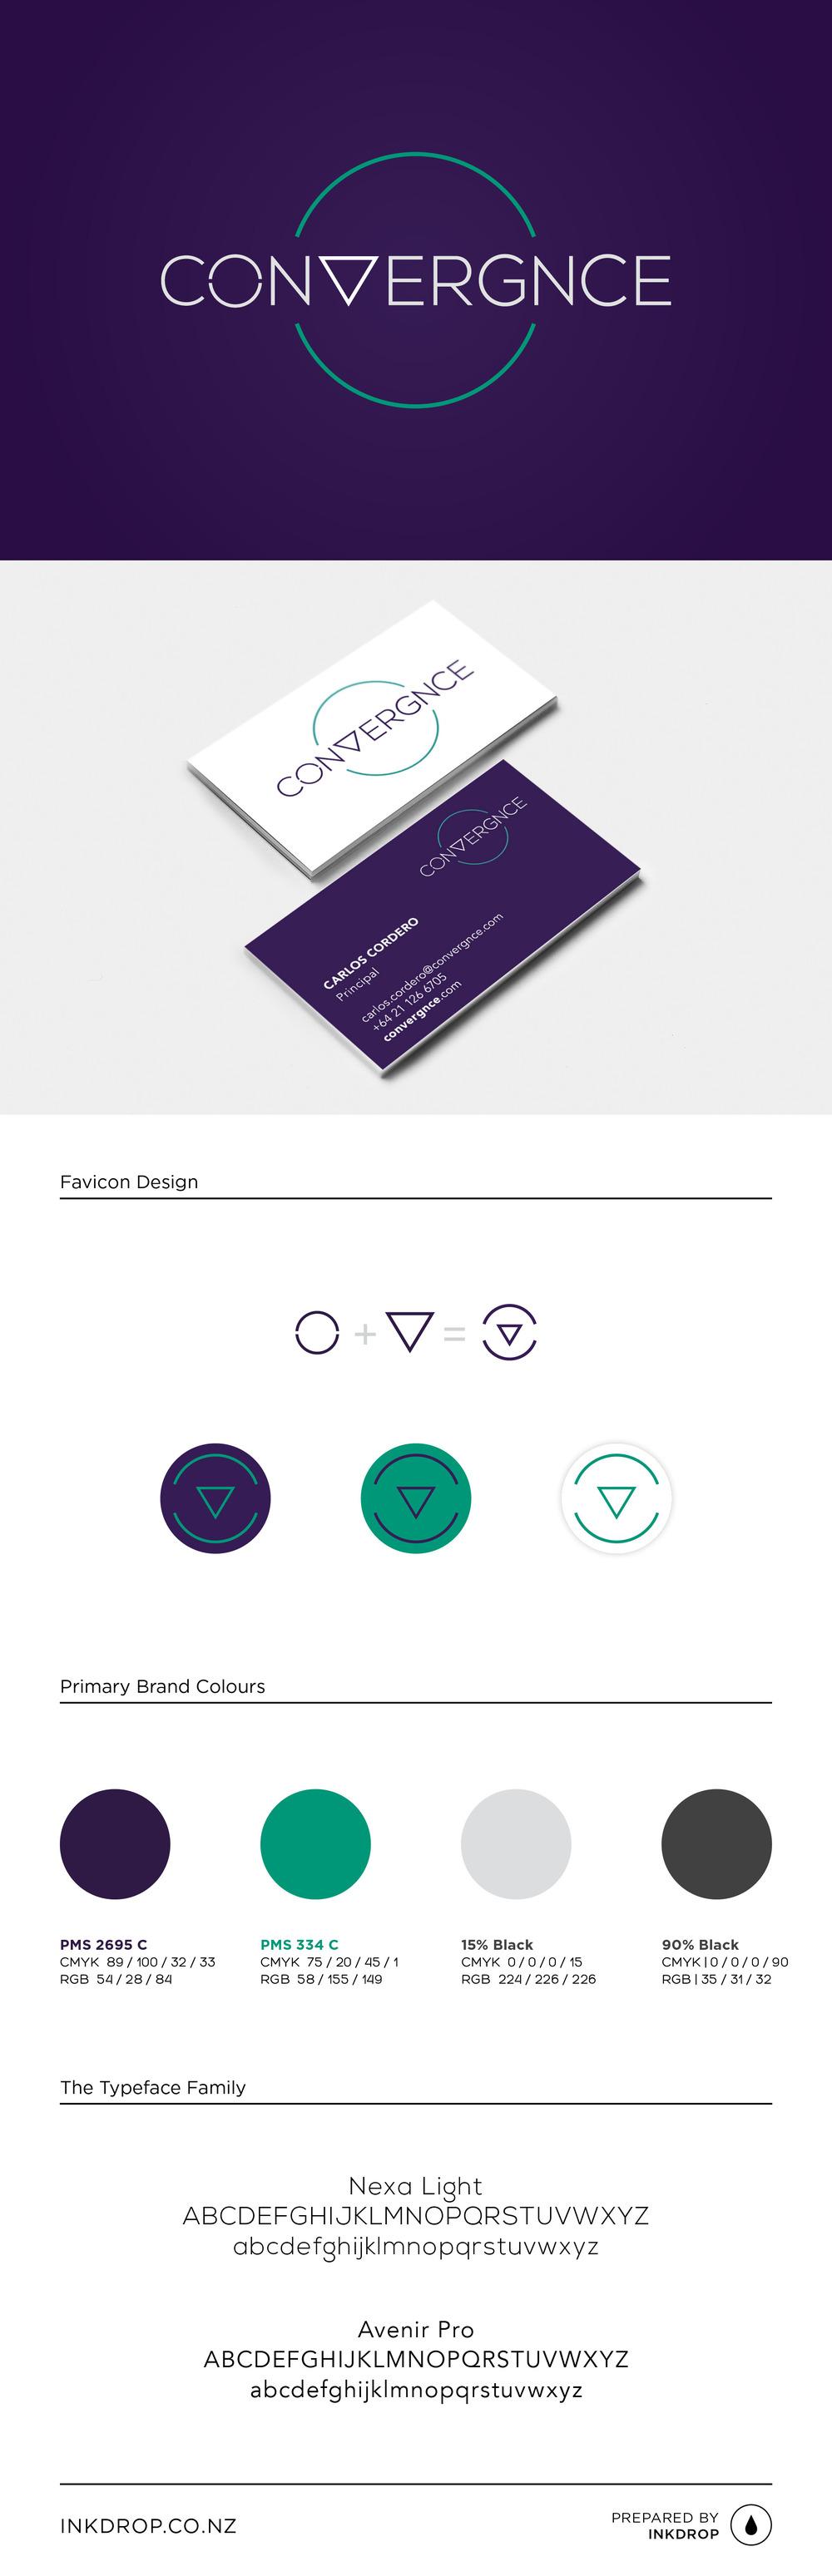 inkdrop_brand_design_convergnce.jpg